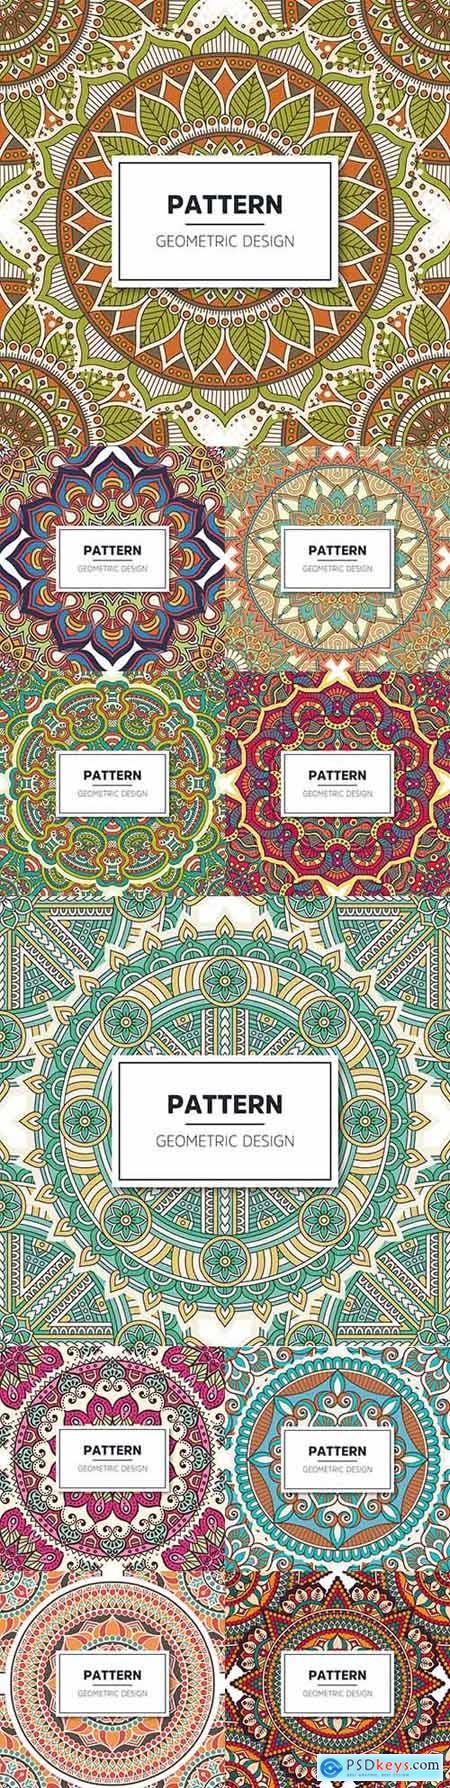 Elegant floral mandala luxury pattern vintage design